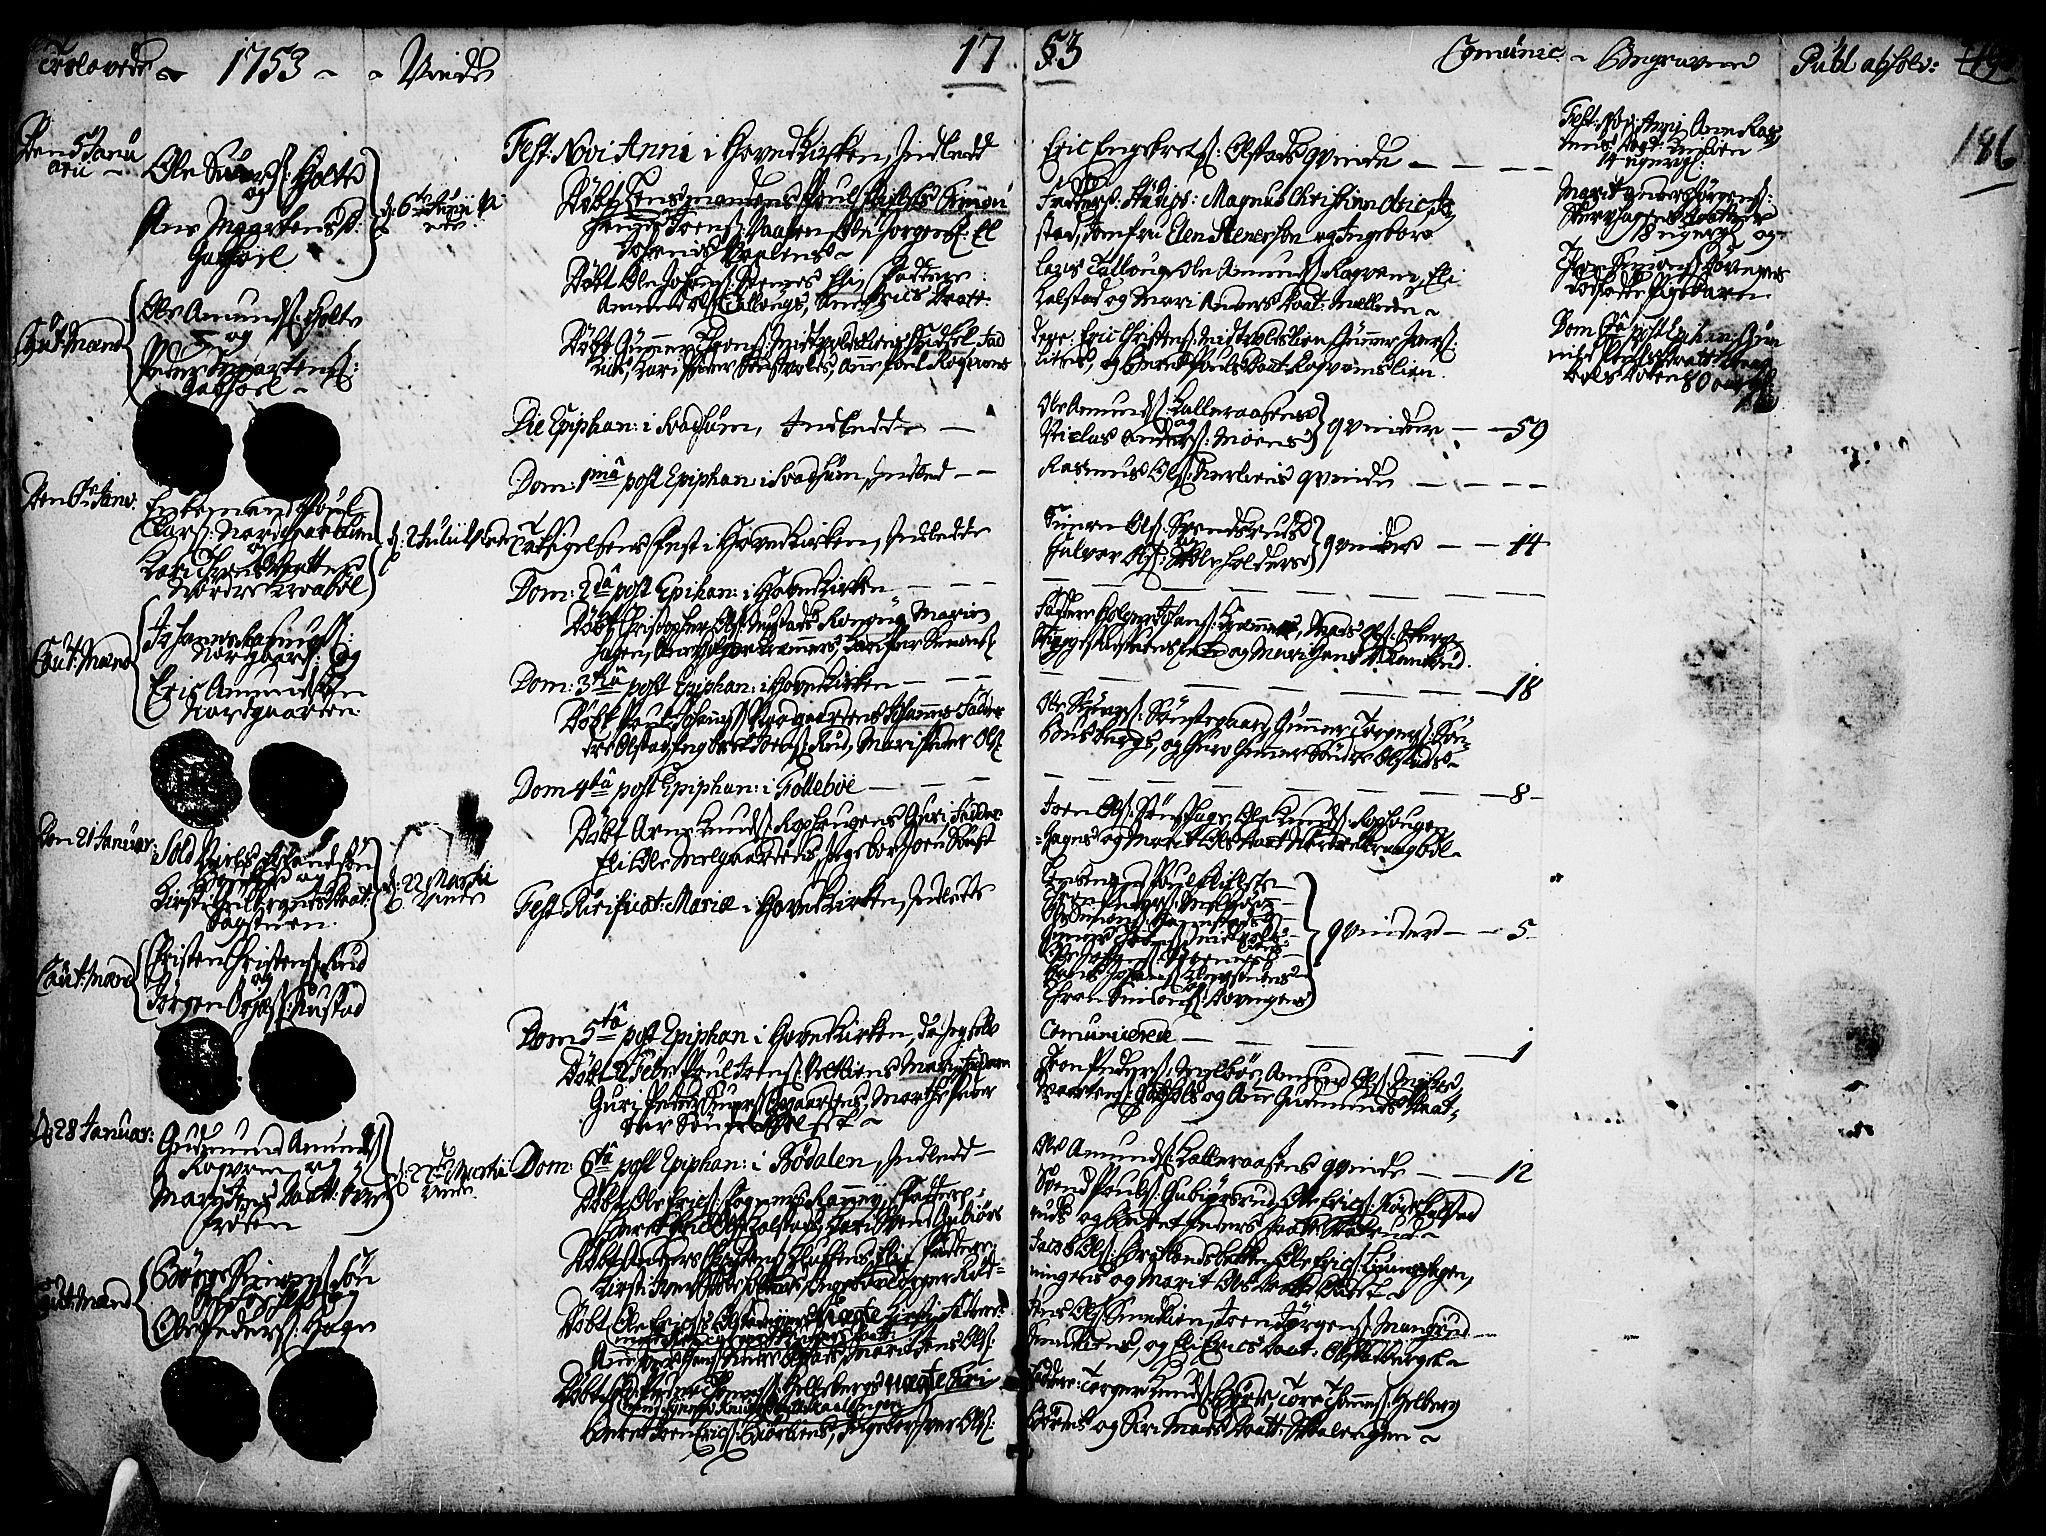 SAH, Gausdal prestekontor, Ministerialbok nr. 2, 1729-1757, s. 186